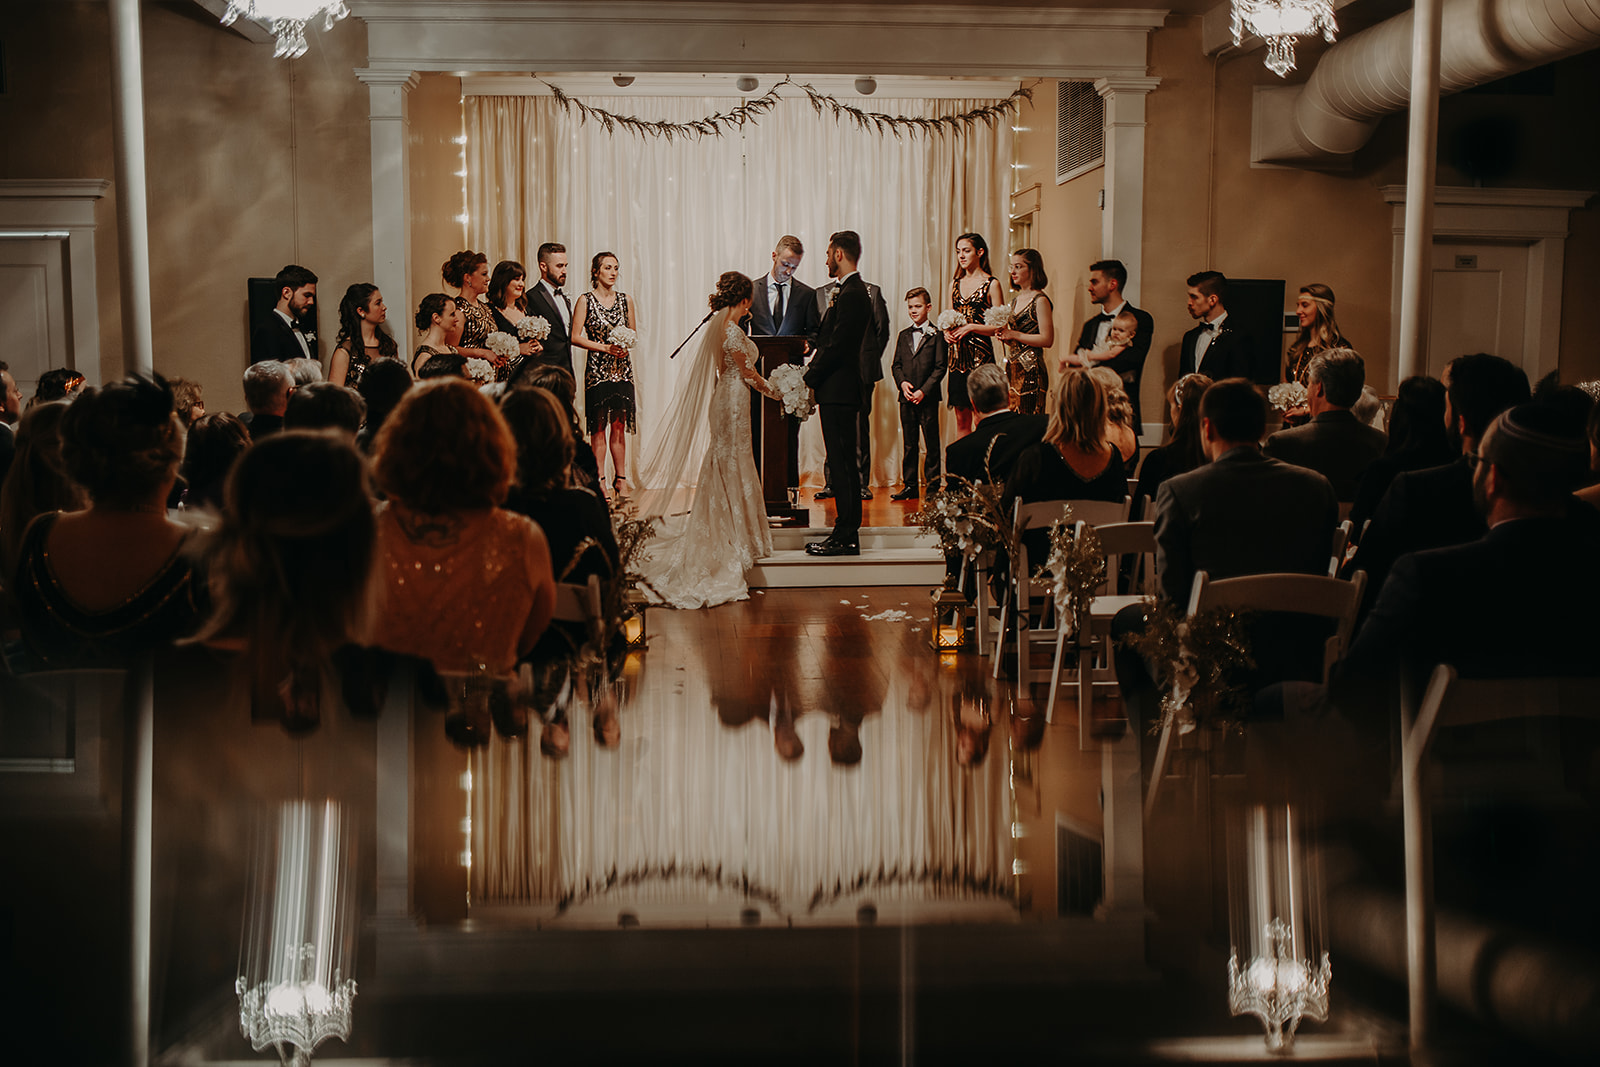 bellingham-wedding-broadway-hall-natalie-levi (54 of 143).jpg